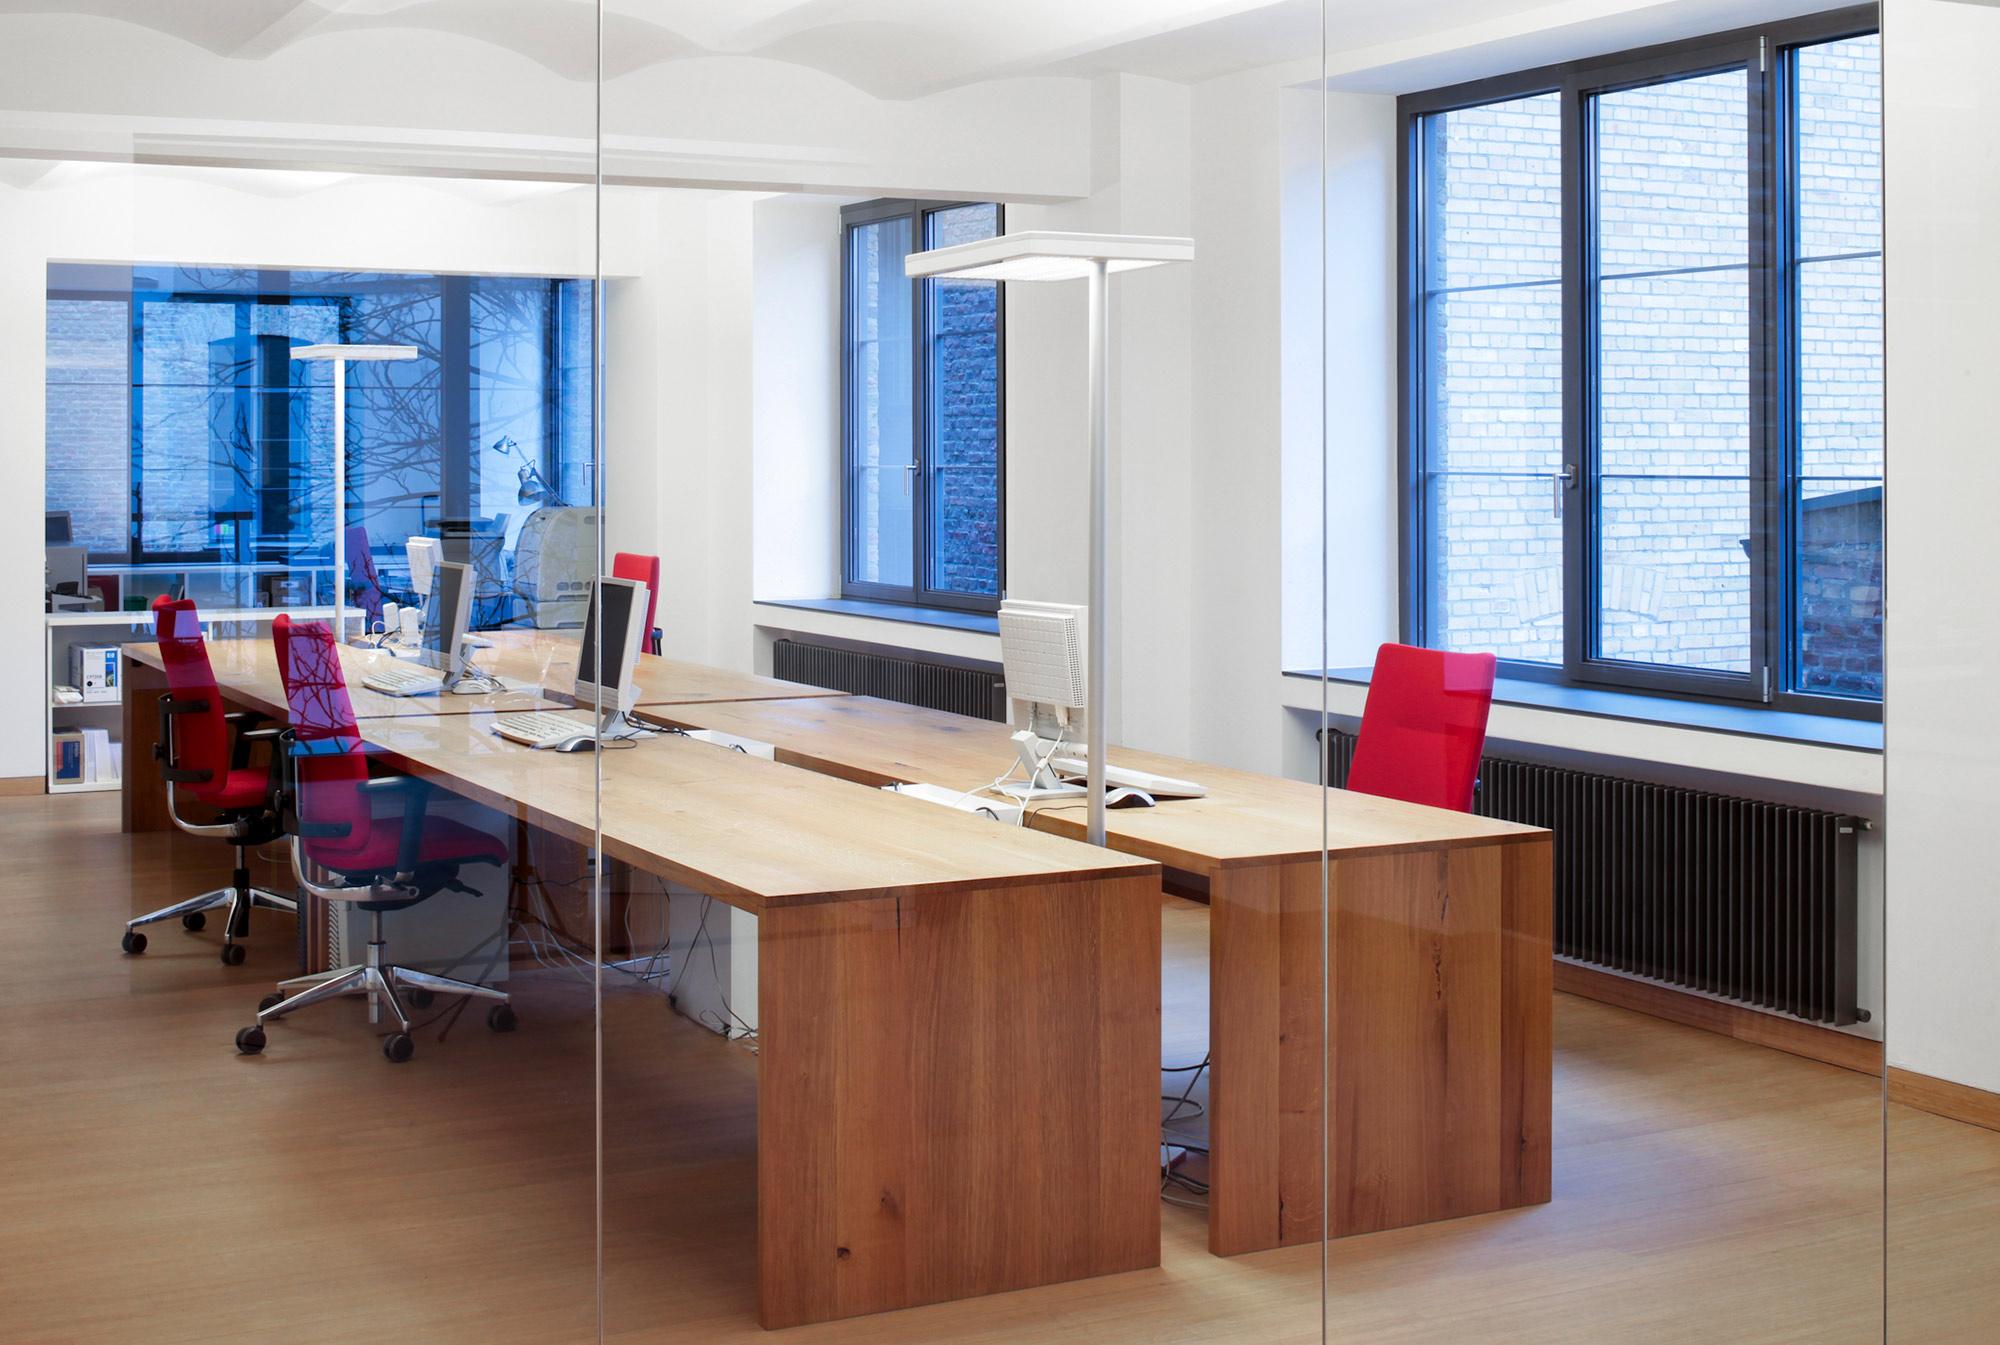 Büroausbau02